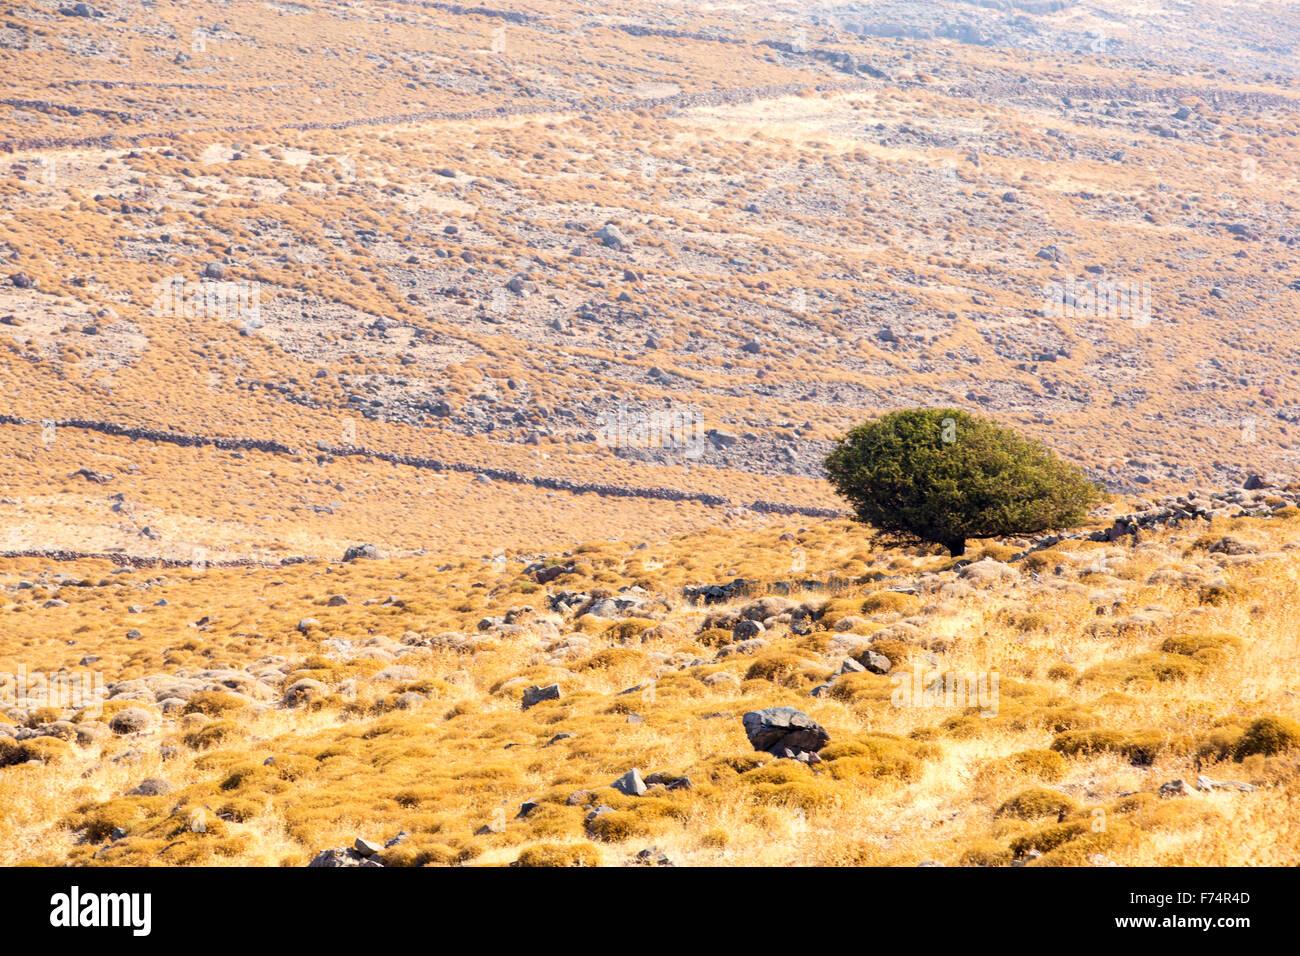 Barren rocky hillsides with sparce thorny vegetation on Western Lesvos above Skala Eresou, Lesvos, Greece. Stock Photo